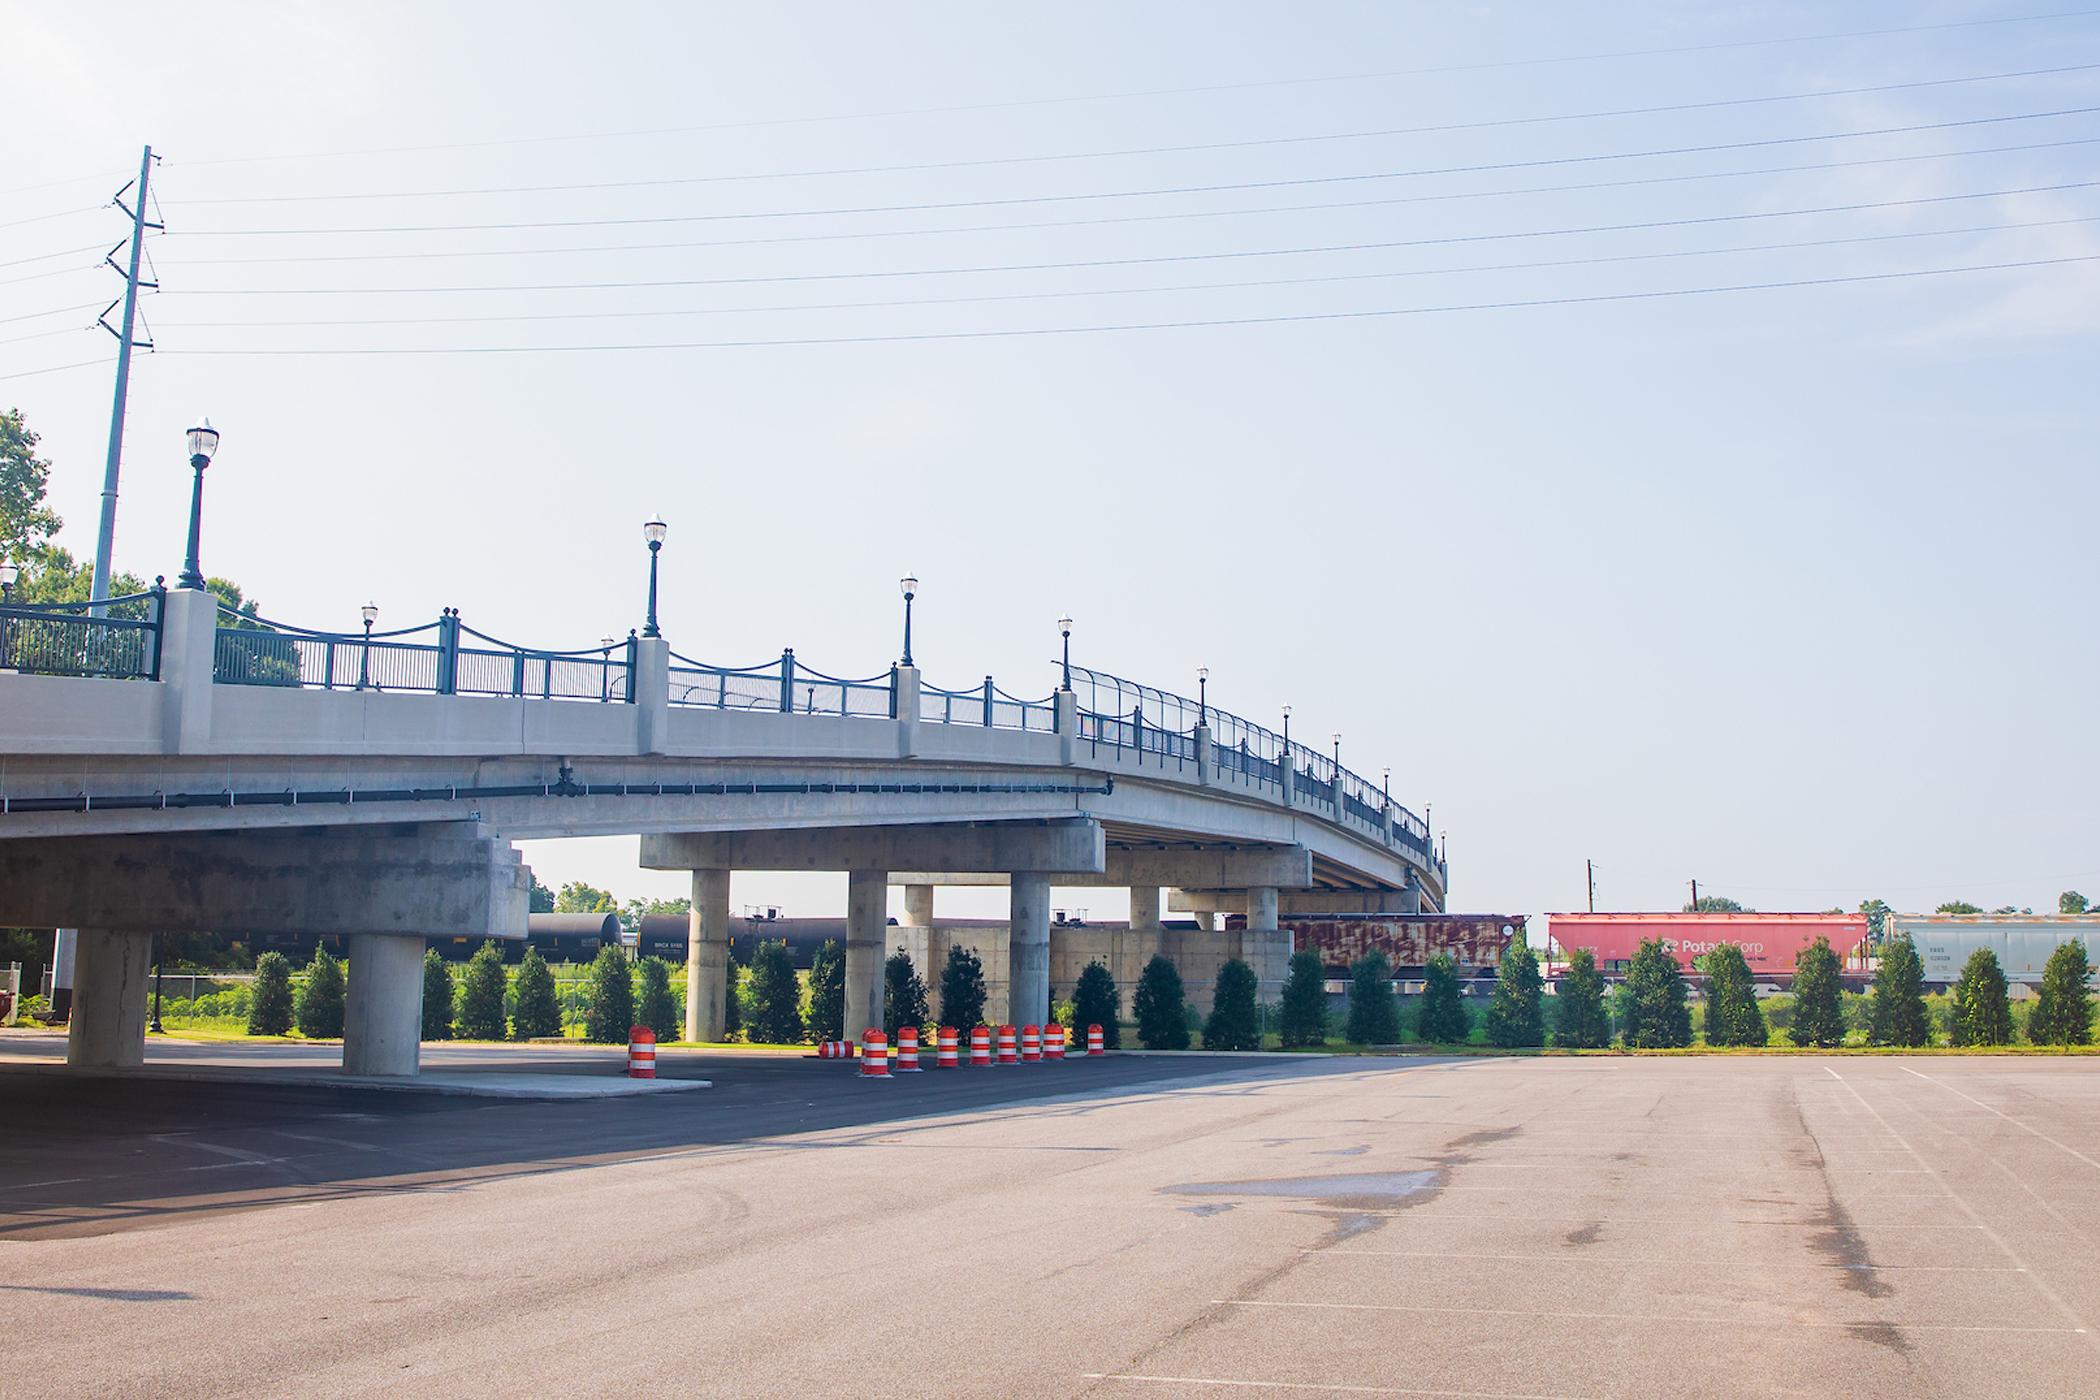 photograph of the second avenue overpass bridge